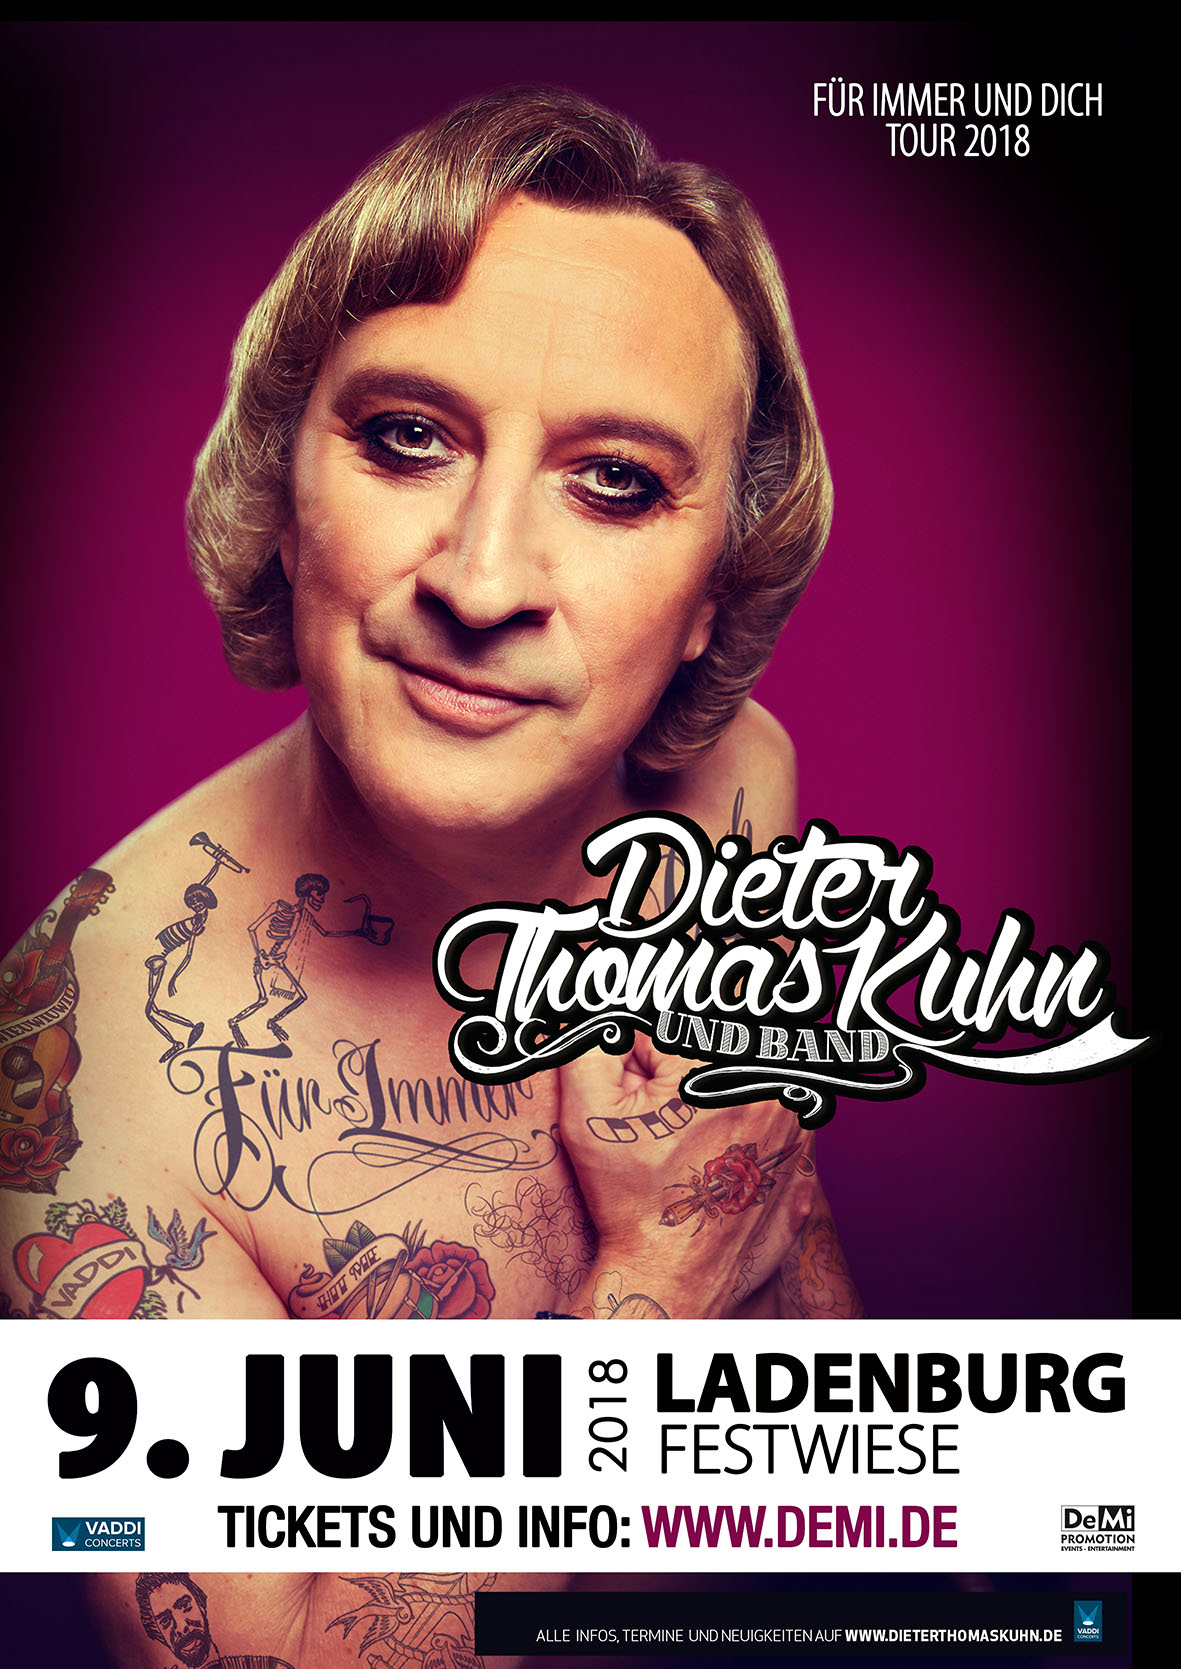 DIETER THOMAS KUHN • LADENBURG